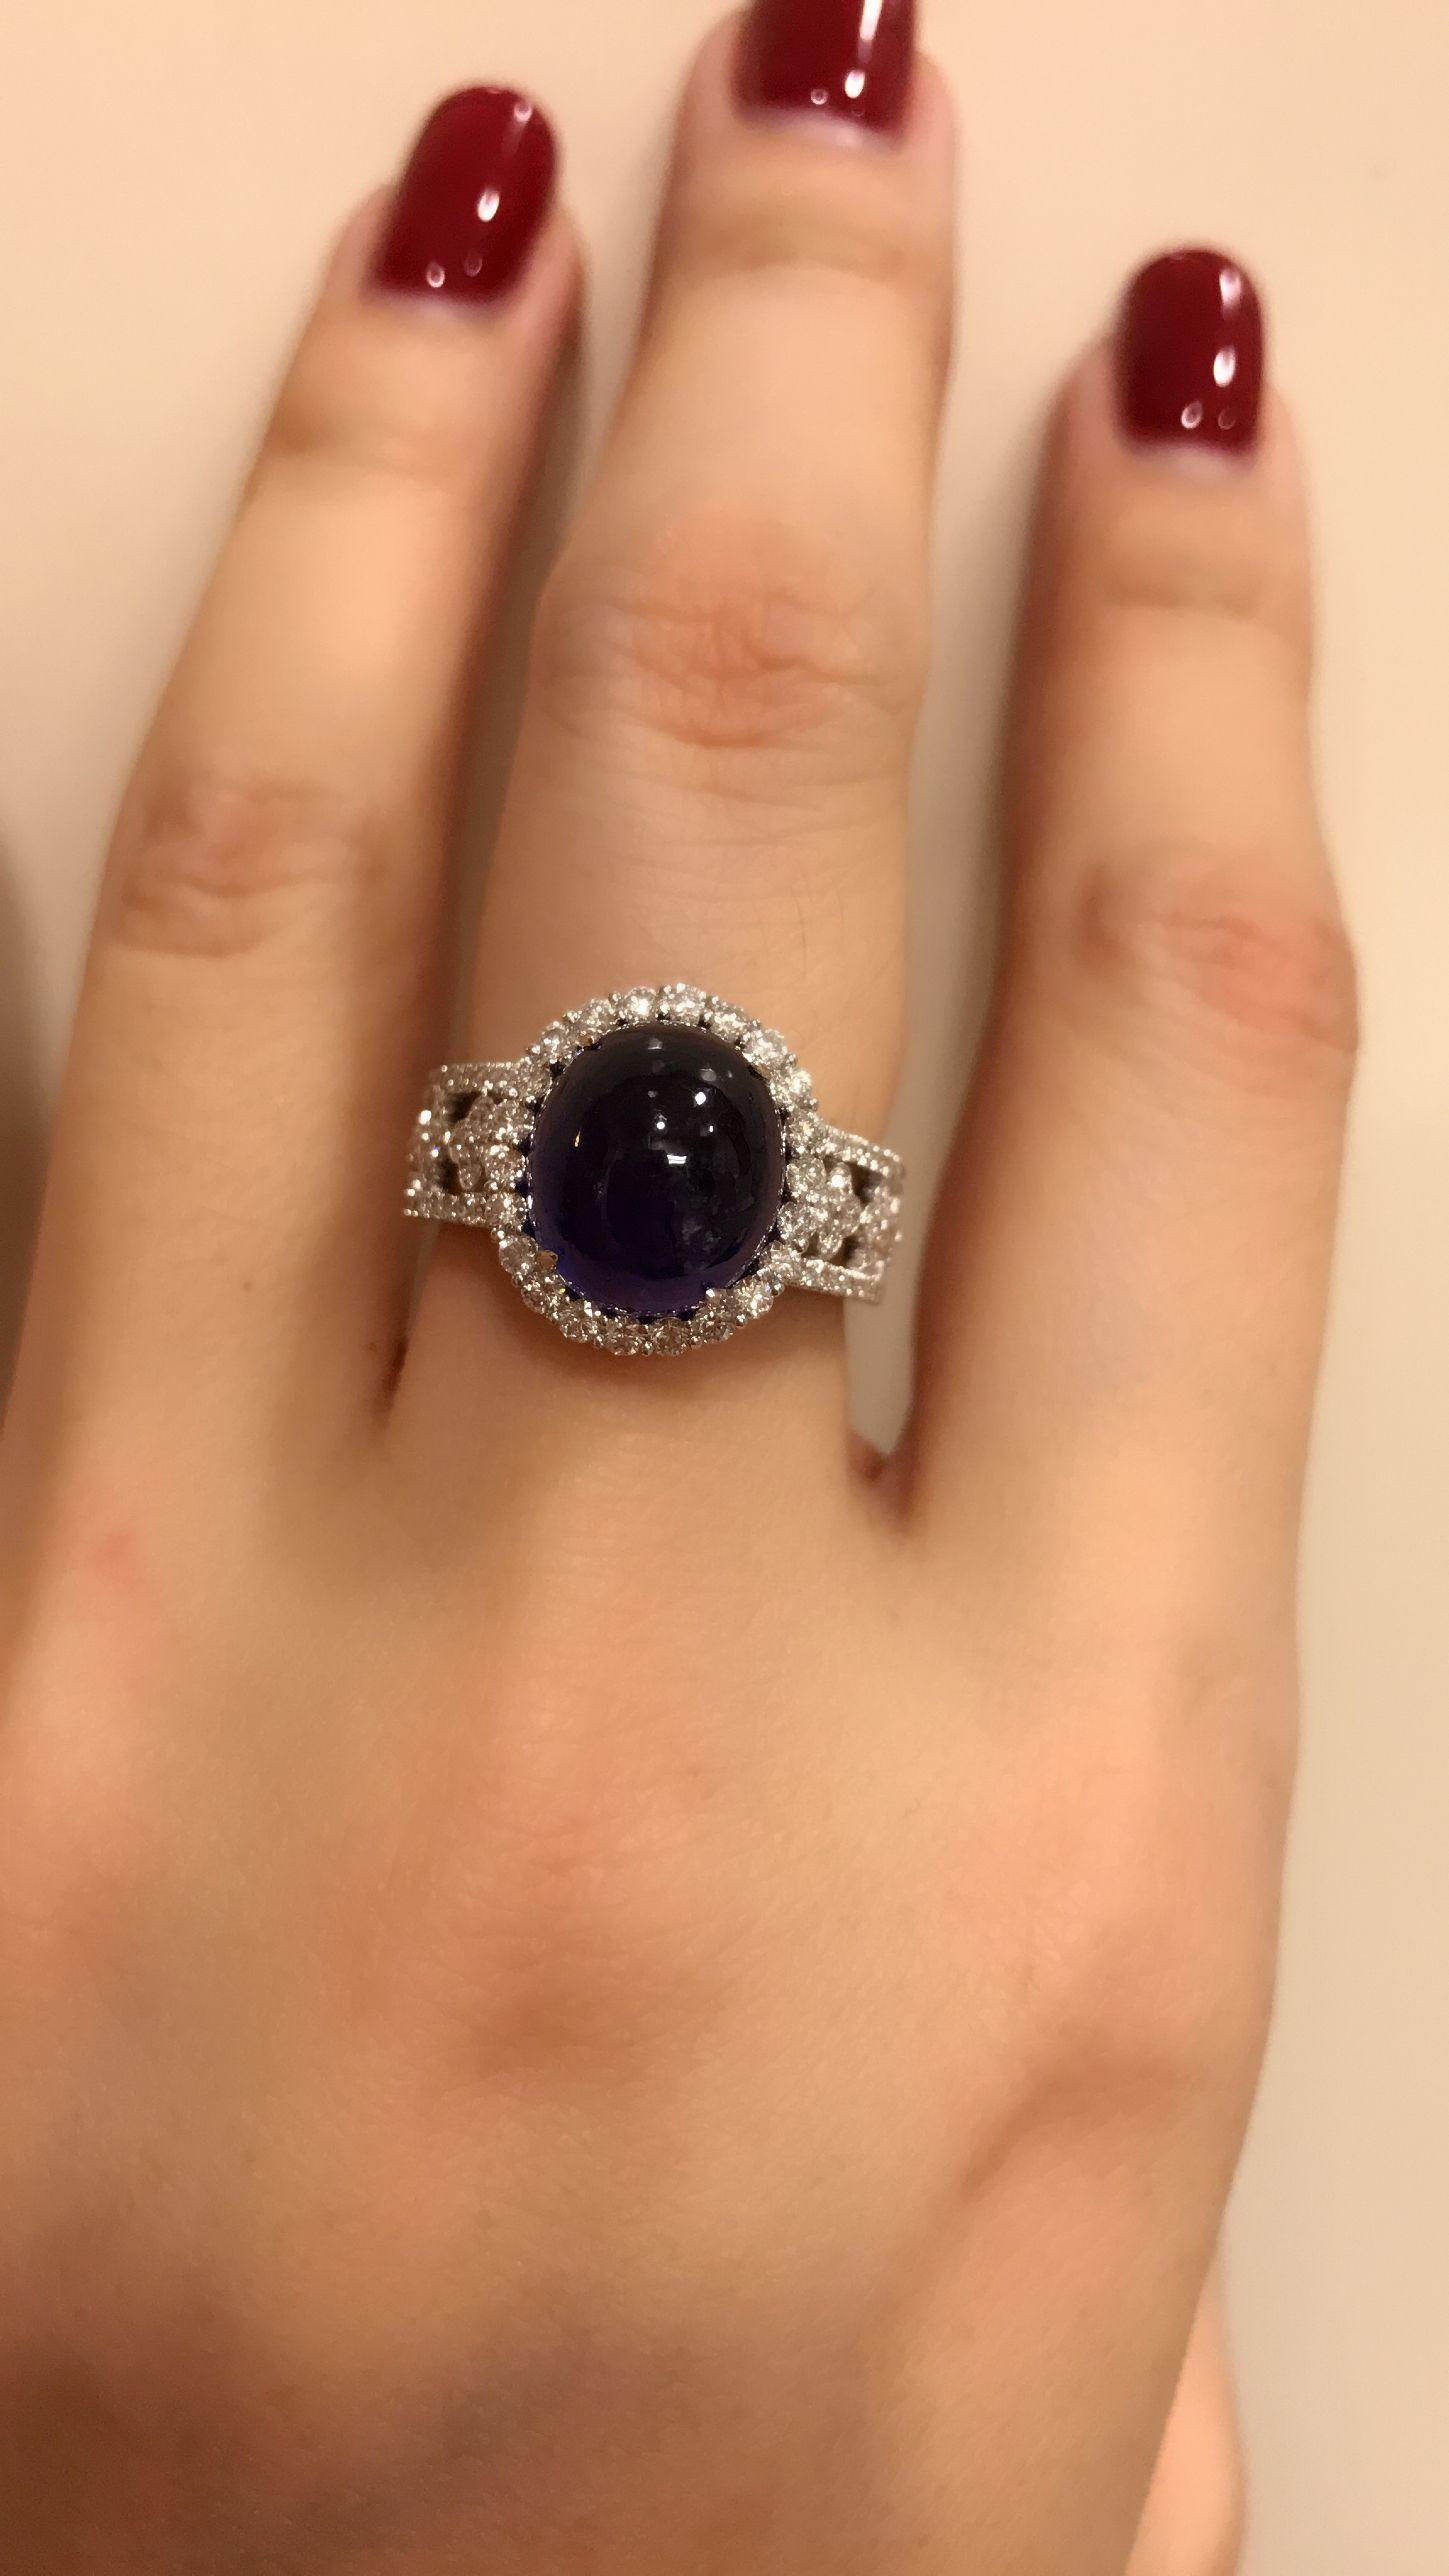 Sapphire and diamond ring jewelry Pinterest